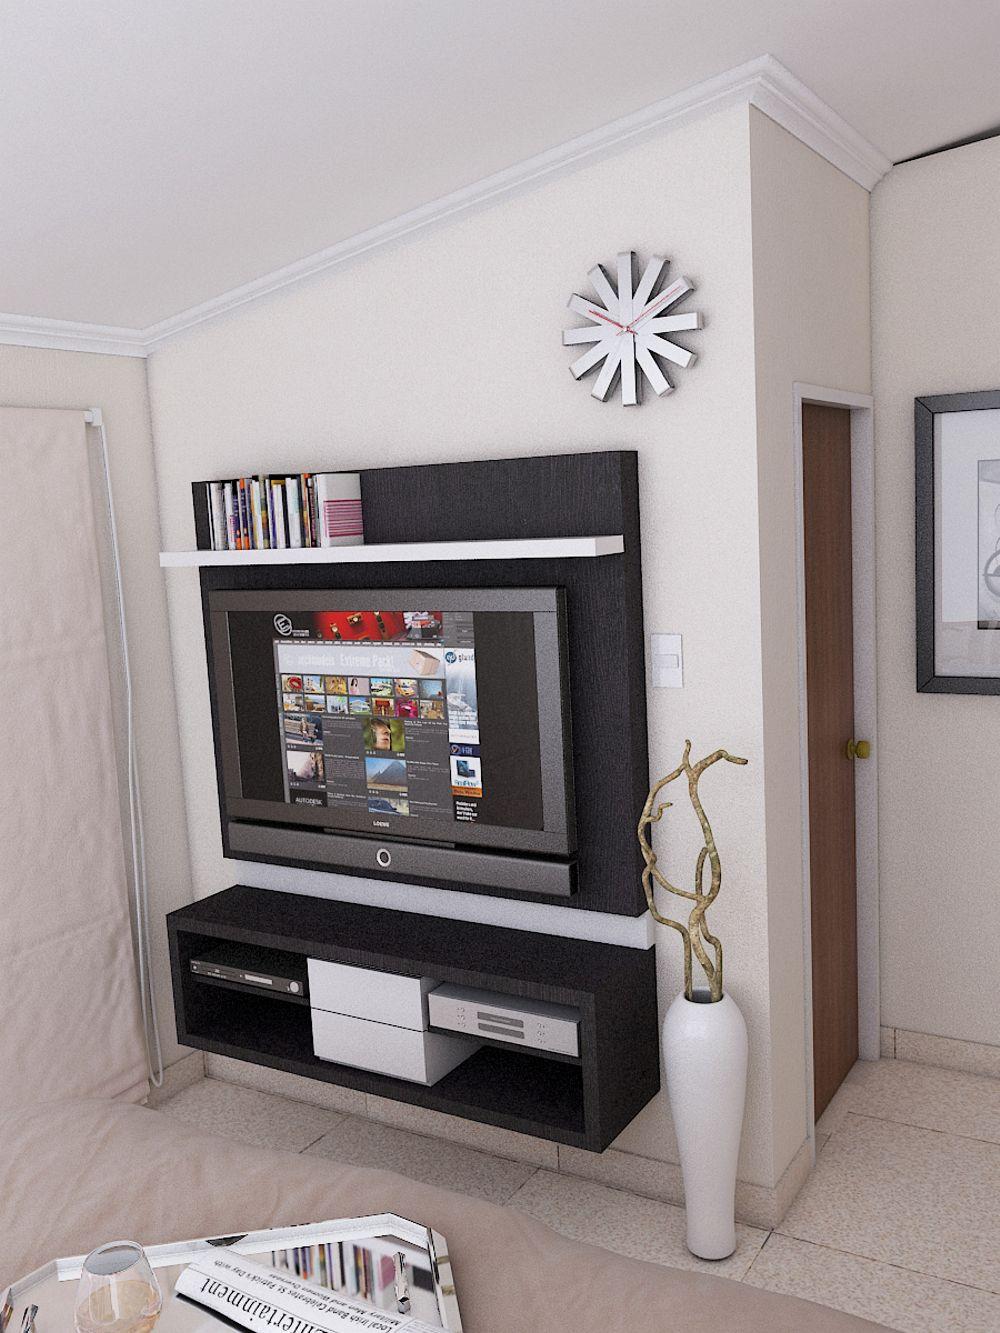 Arq carlos j martinez g interiorismo interior for Habitacion familiar en once